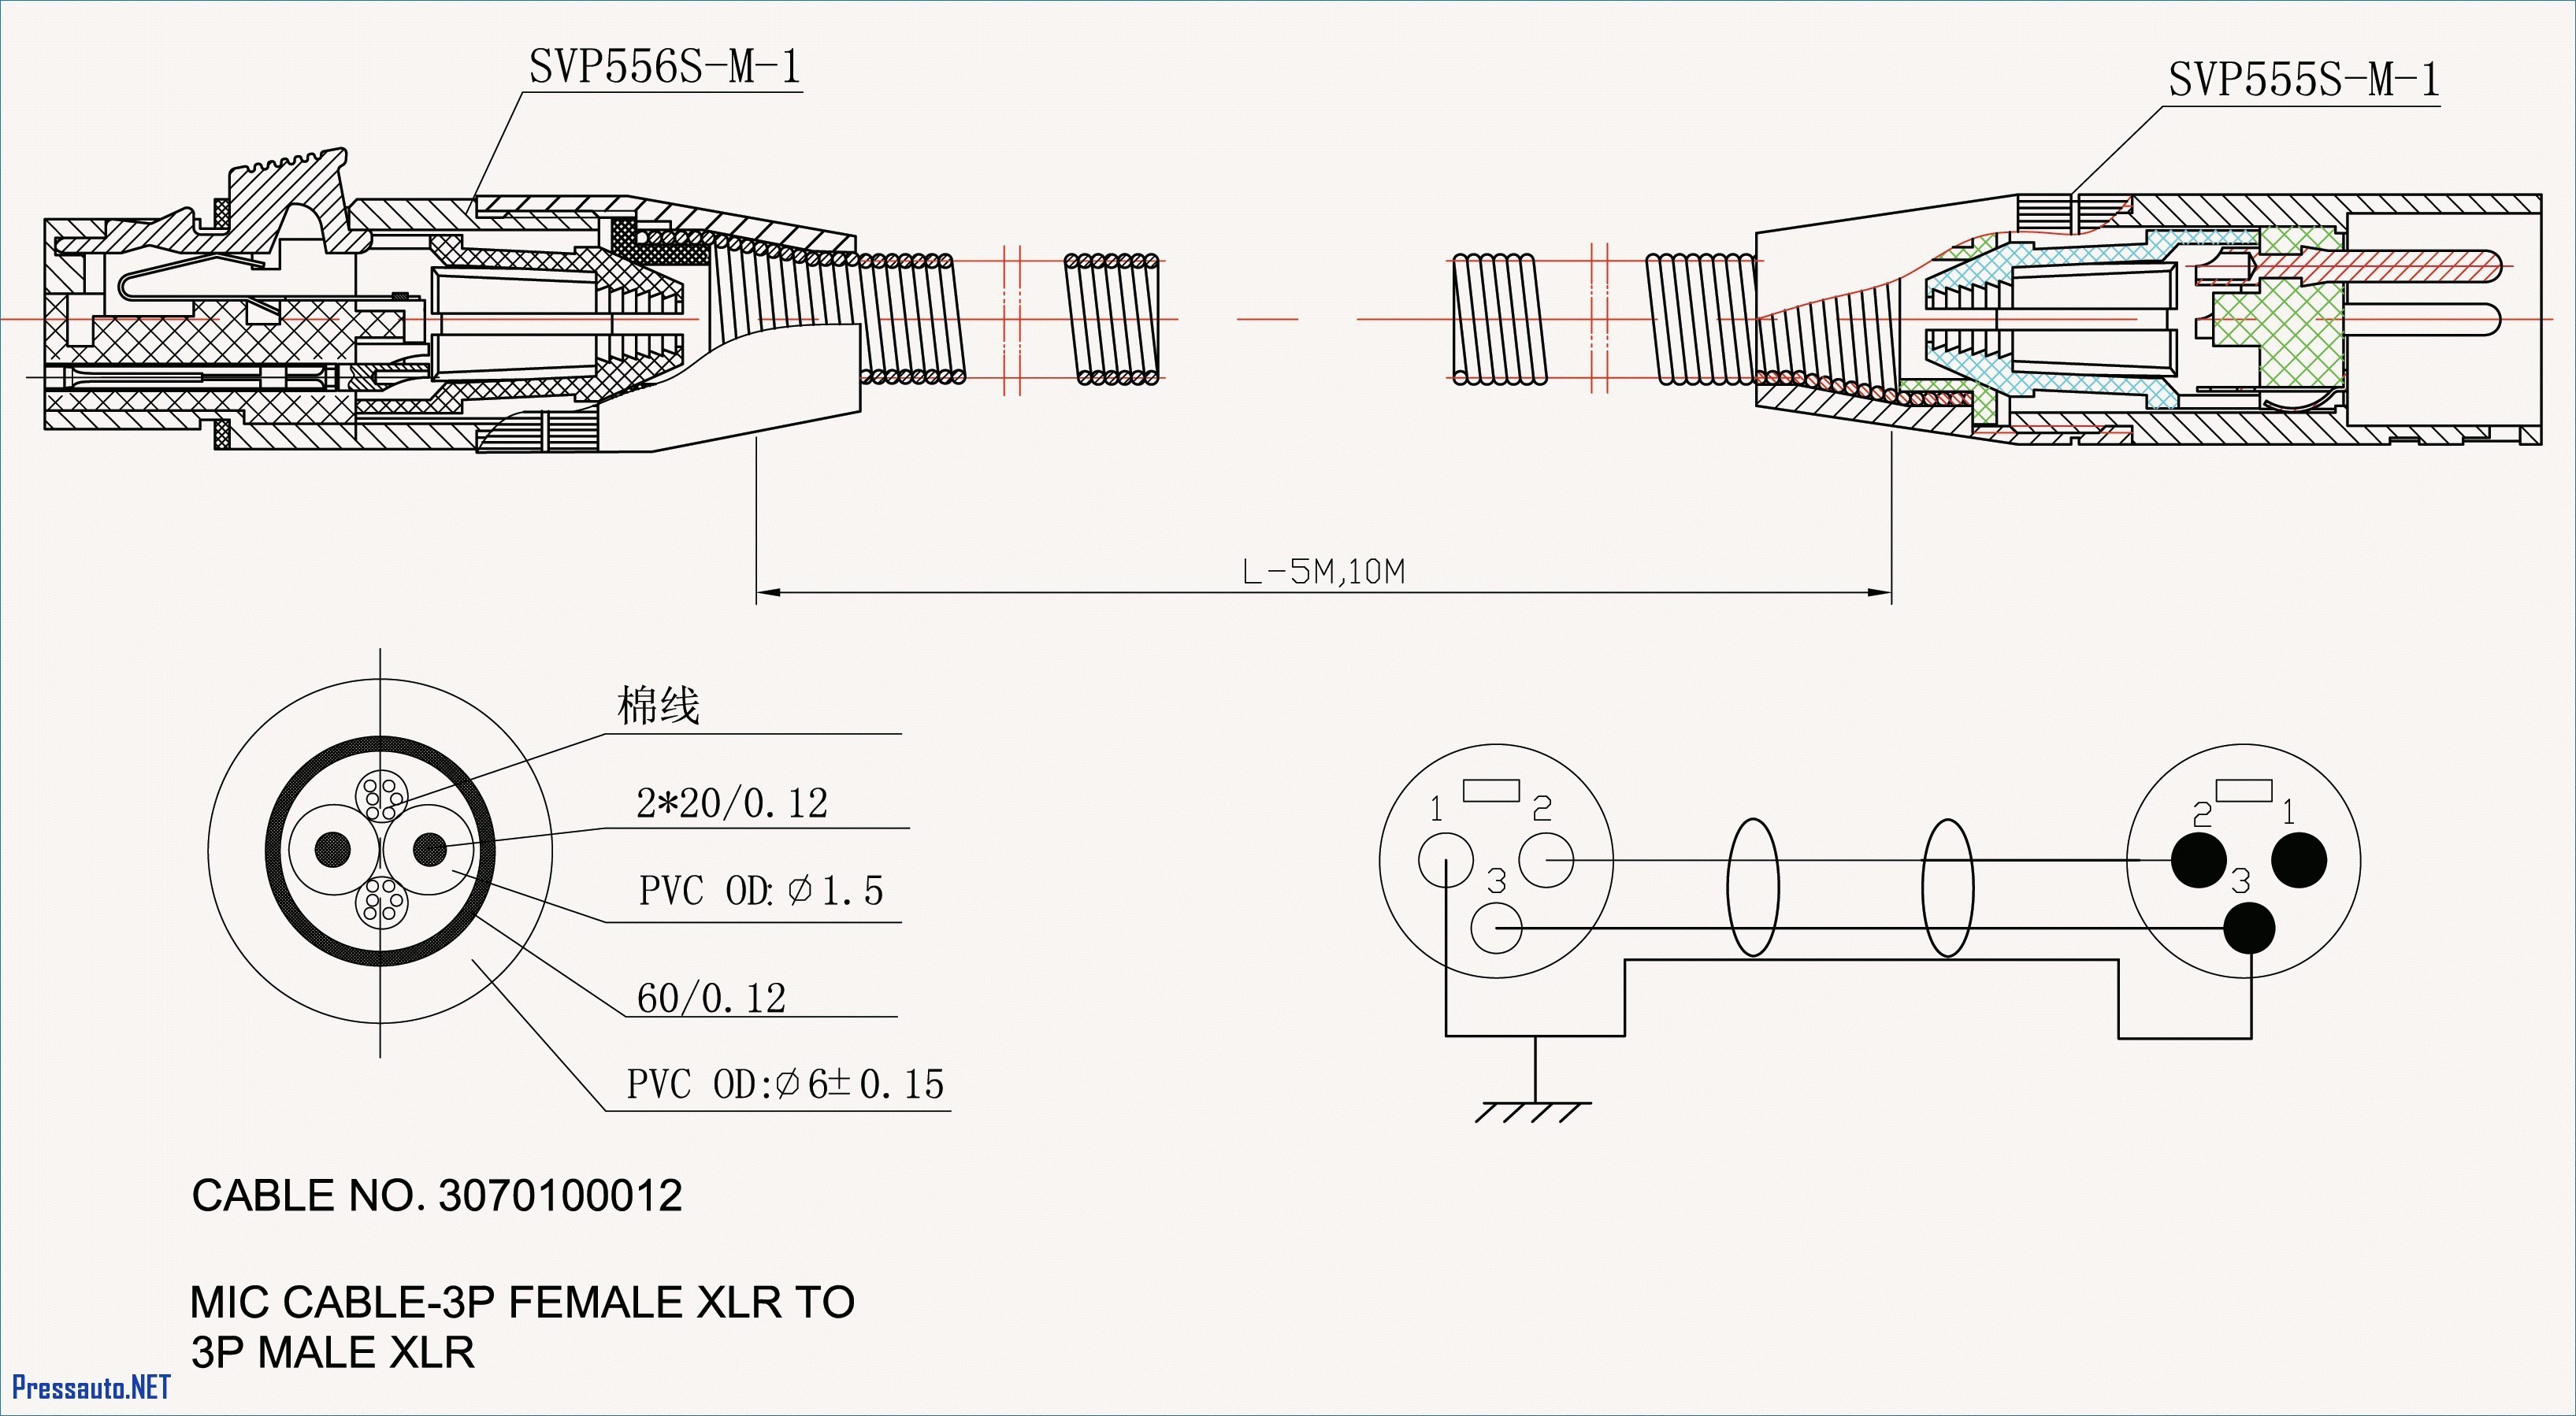 Golf Cart Wiring Diagram Best Of Popular Starter Generator Wiring - Club Car Starter Generator Wiring Diagram